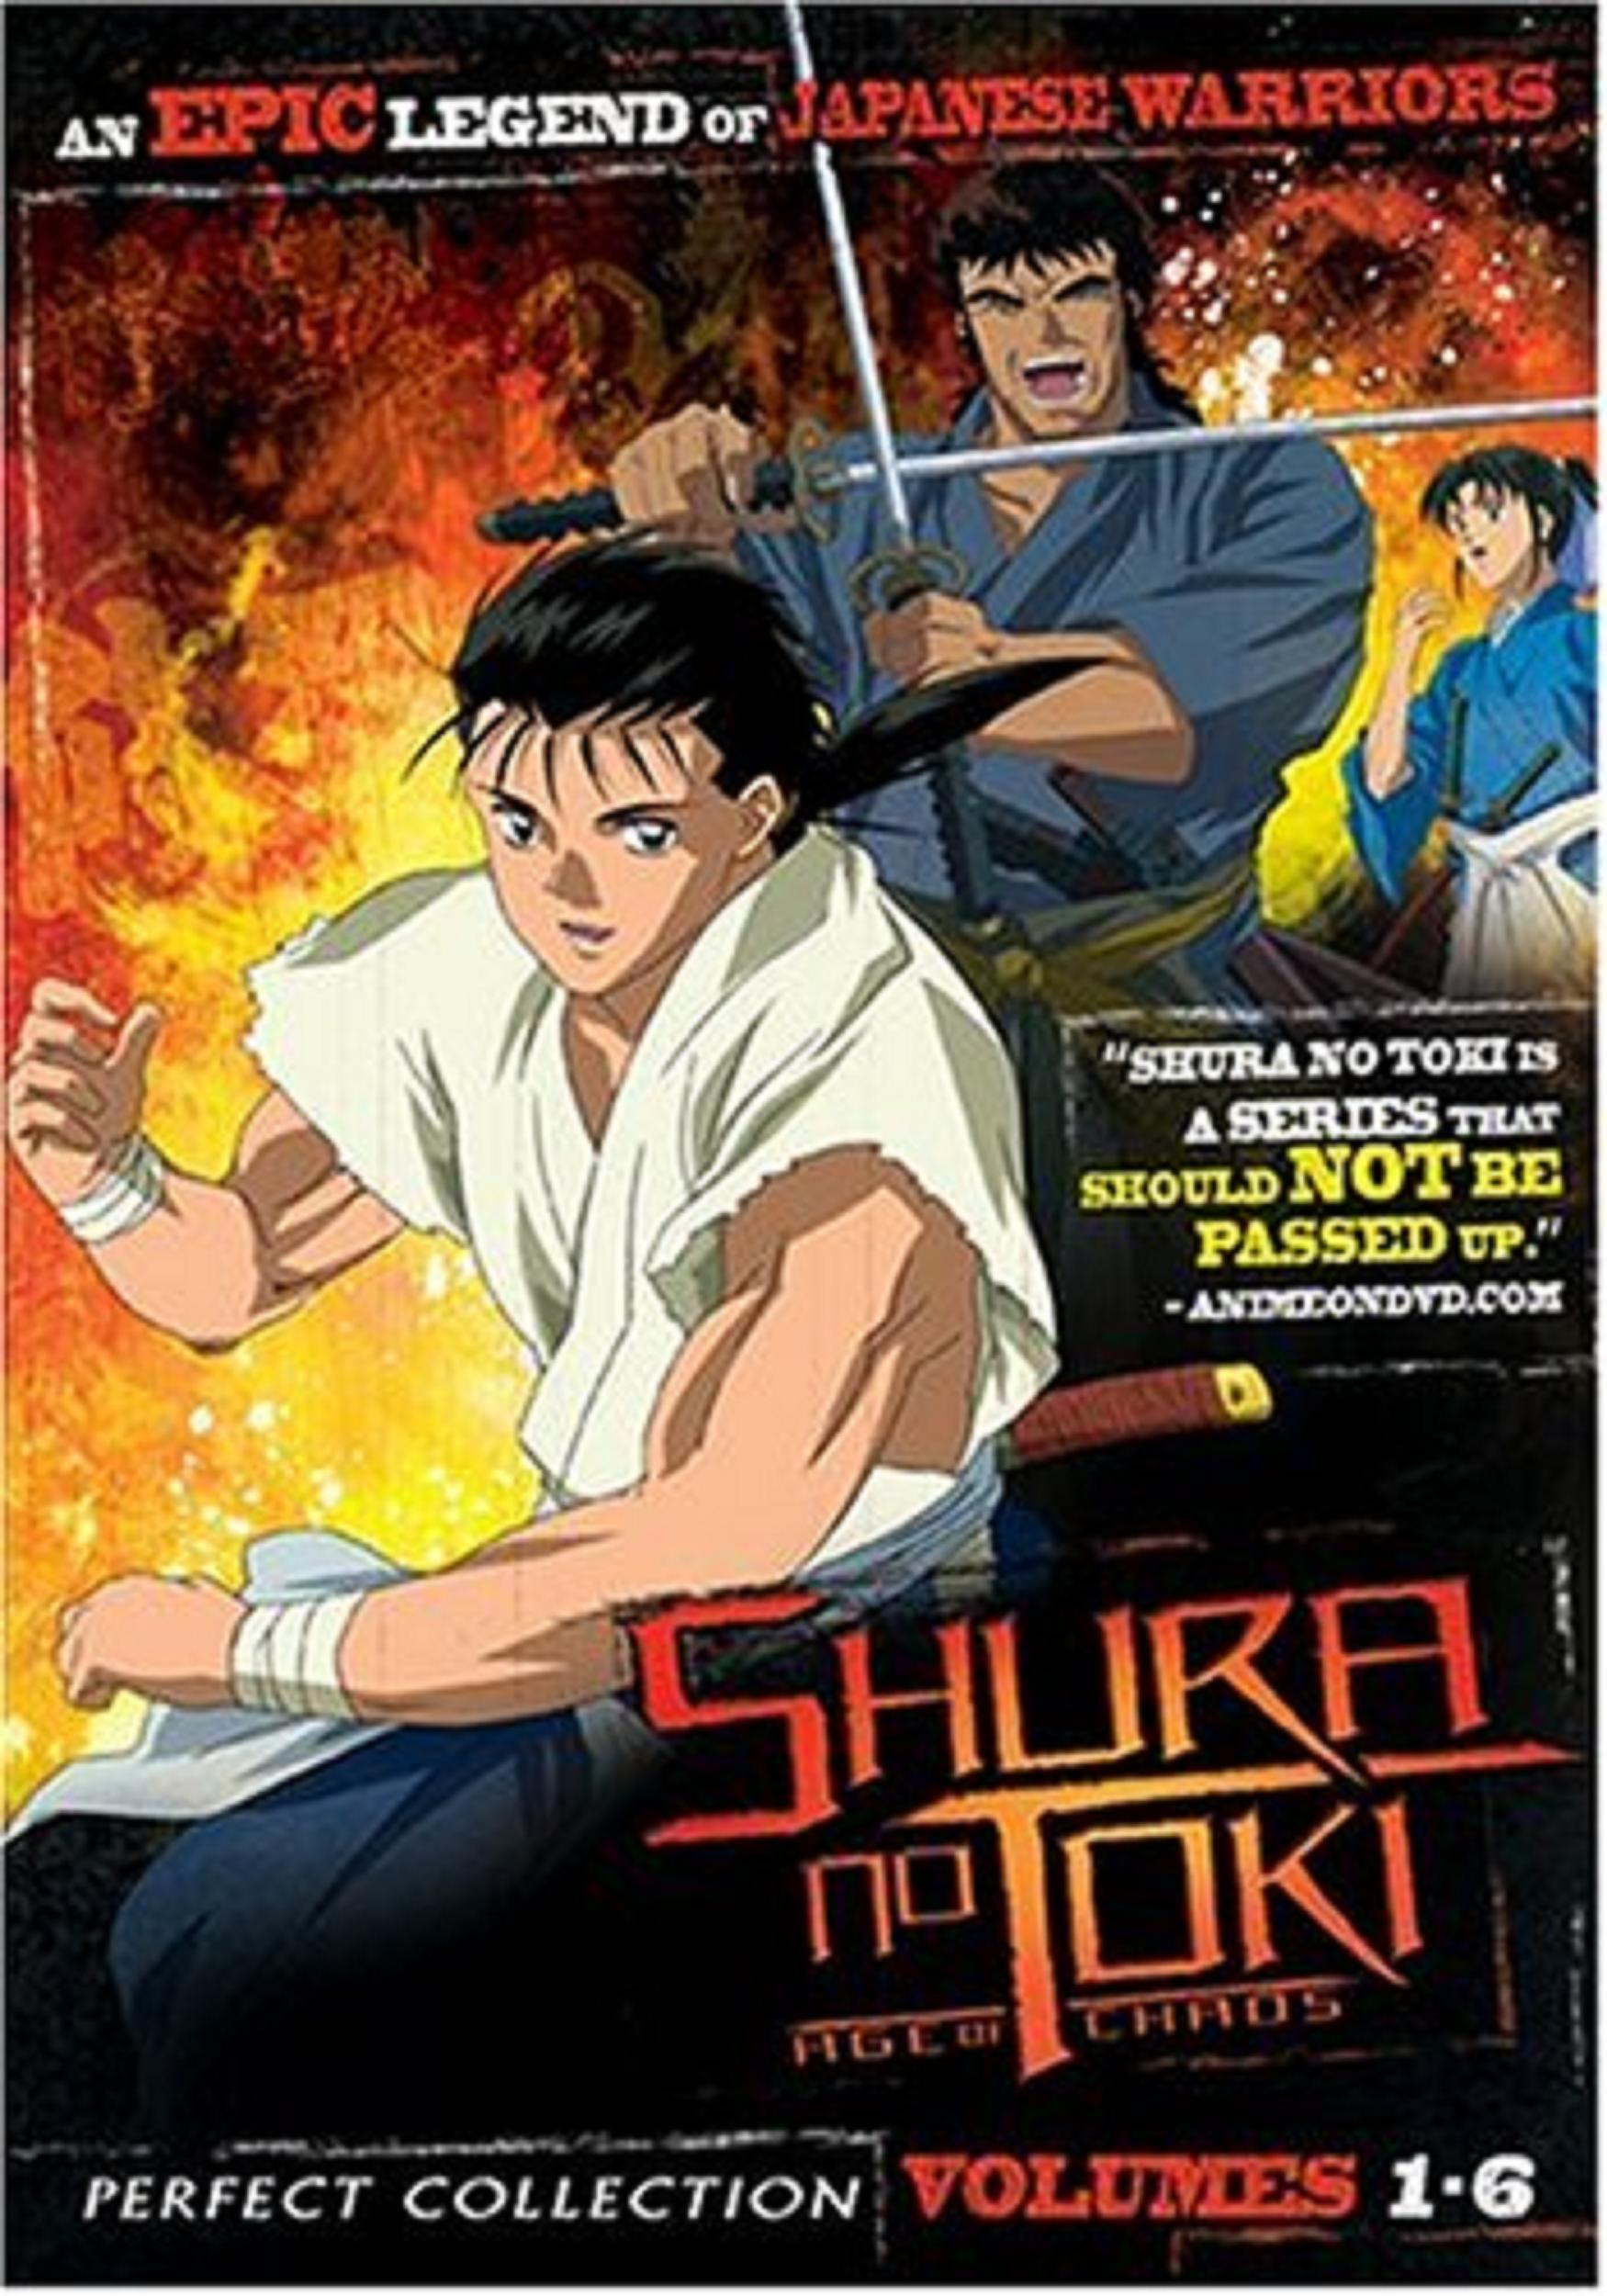 دانلود زیرنویس فارسی سریال Shura no Toki: Age of Chaos